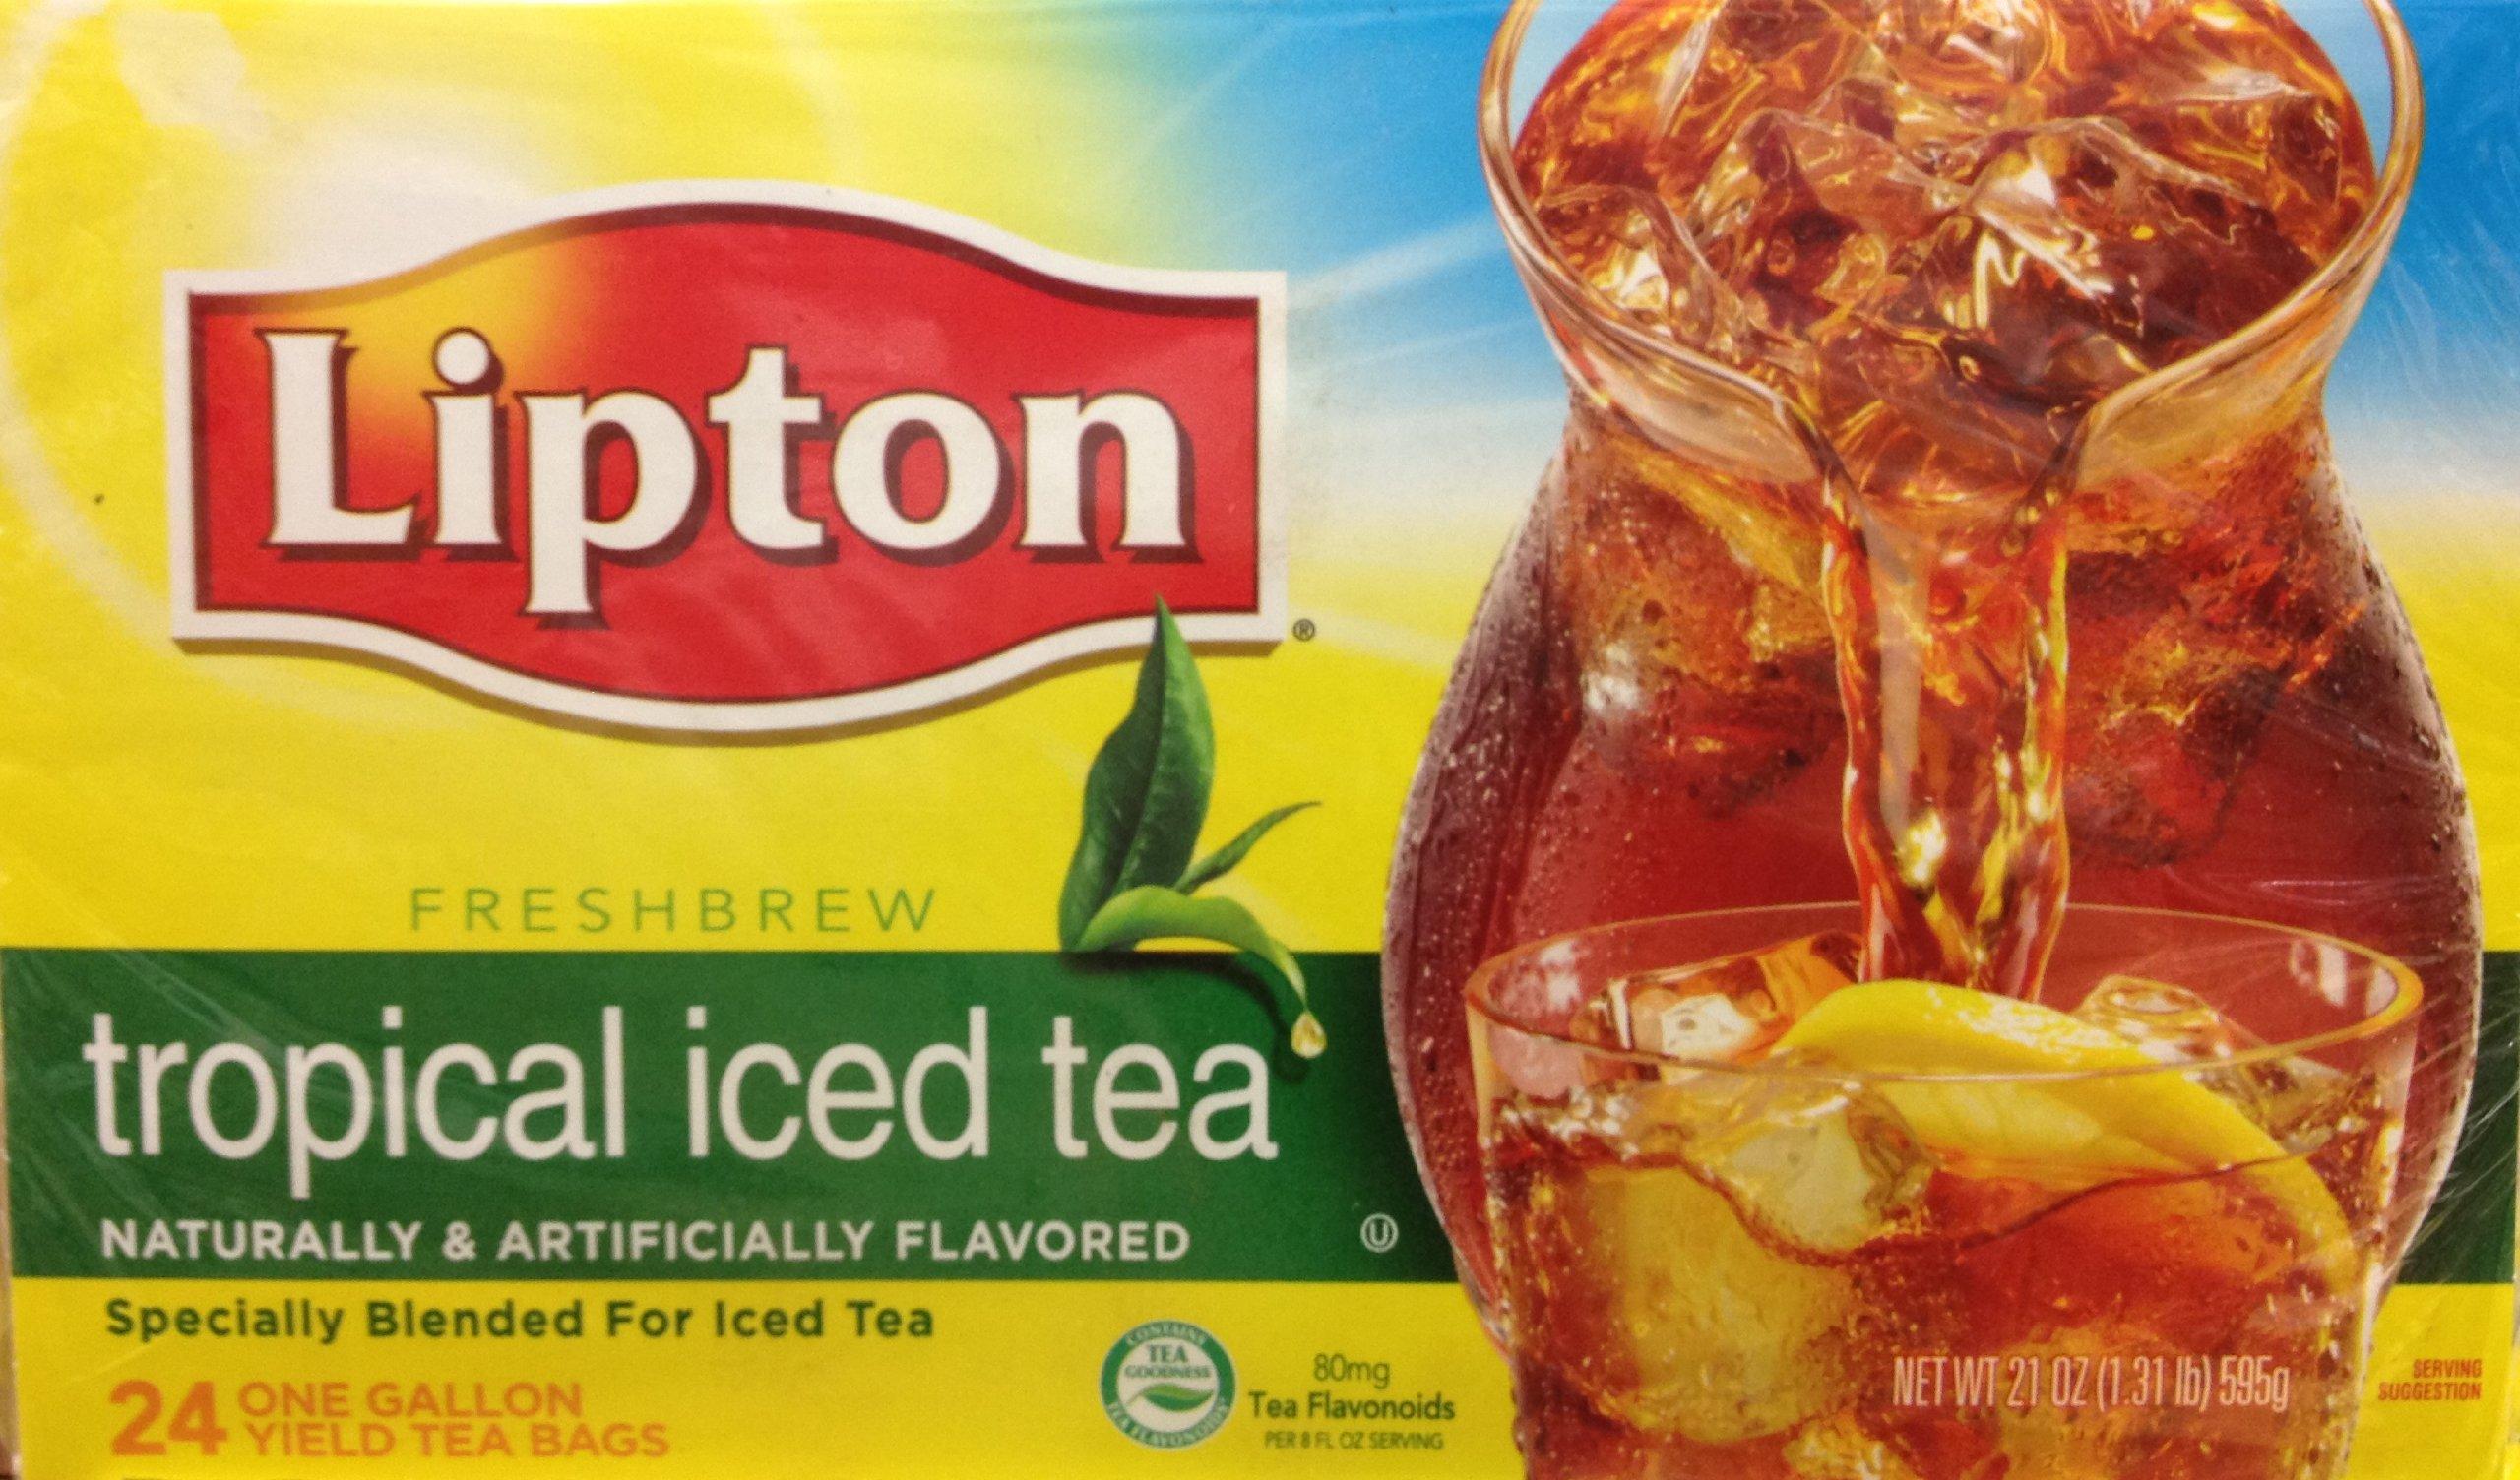 24 Gallon Size Lipton Tropical Iced Tea Bags (1 Box per order) by Lipton